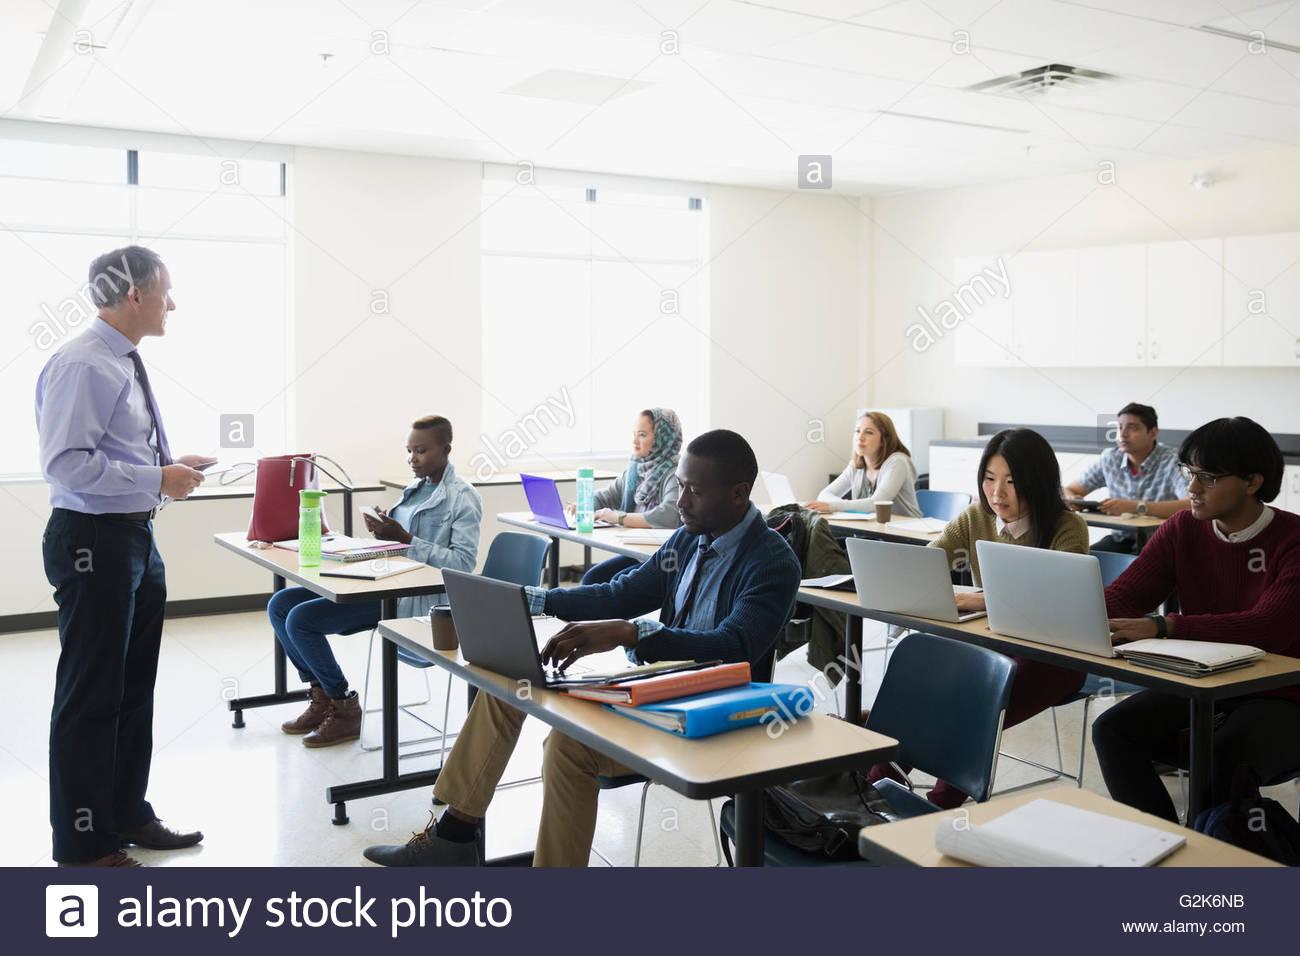 Professor leading ESL lesson in classroom - Stock Image